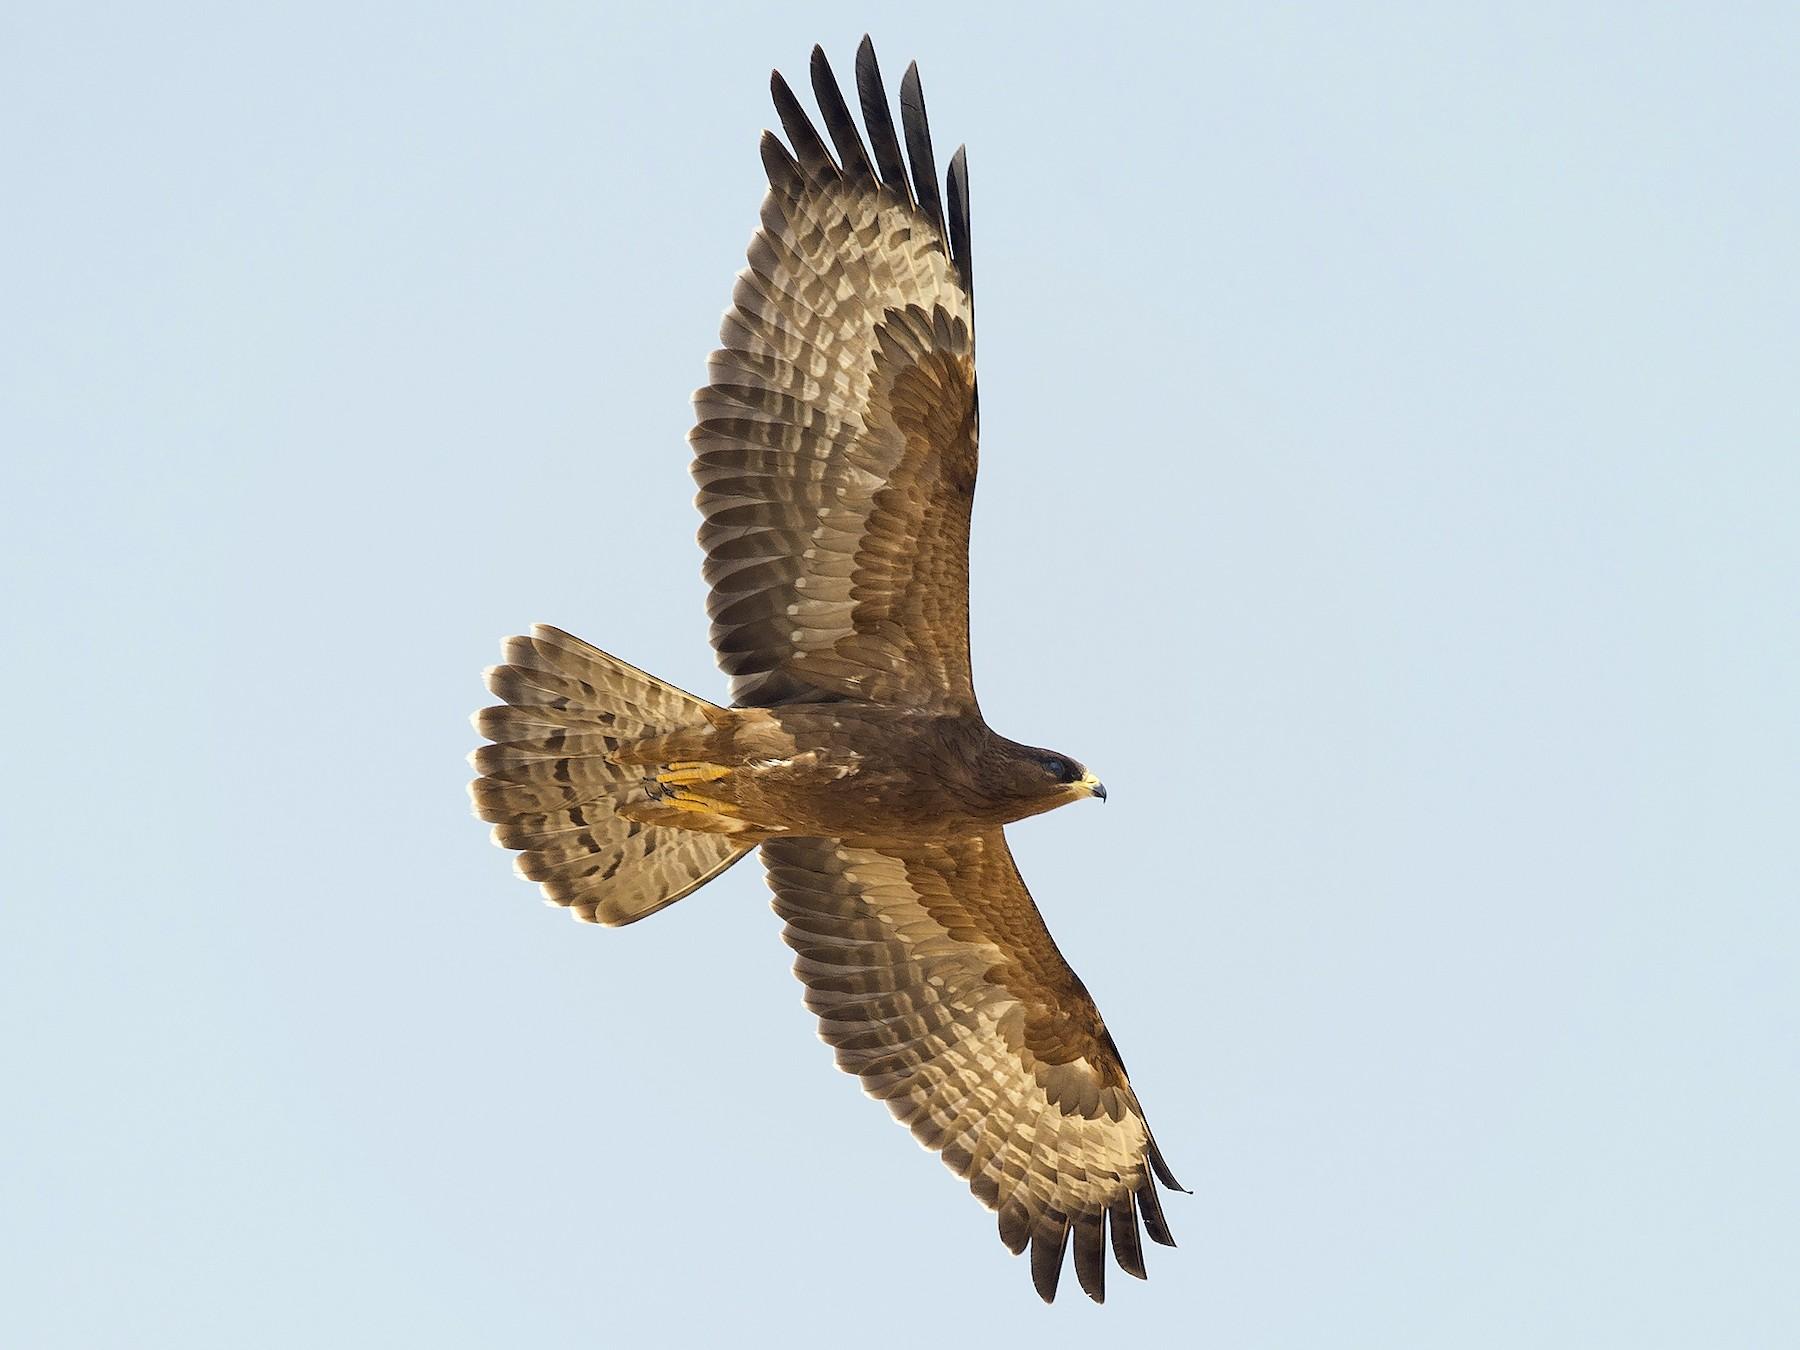 Oriental Honey-buzzard - Omar alshaheen